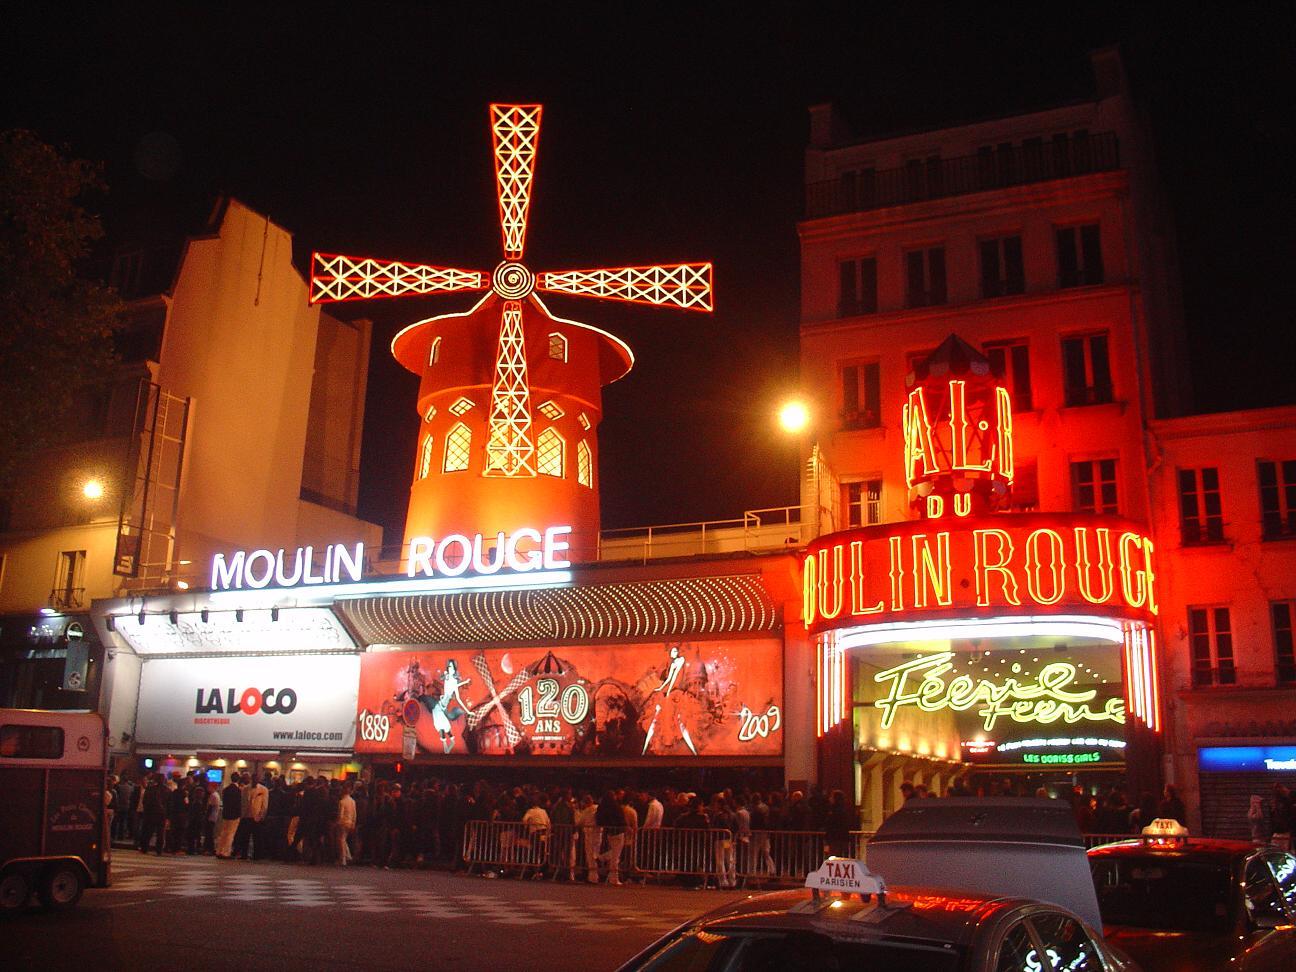 http://4.bp.blogspot.com/_5QdF-3c1Ae4/TOL2jLKHyRI/AAAAAAAACJI/K4gkuXMxG2s/s1600/Moulin+Rouge.JPG